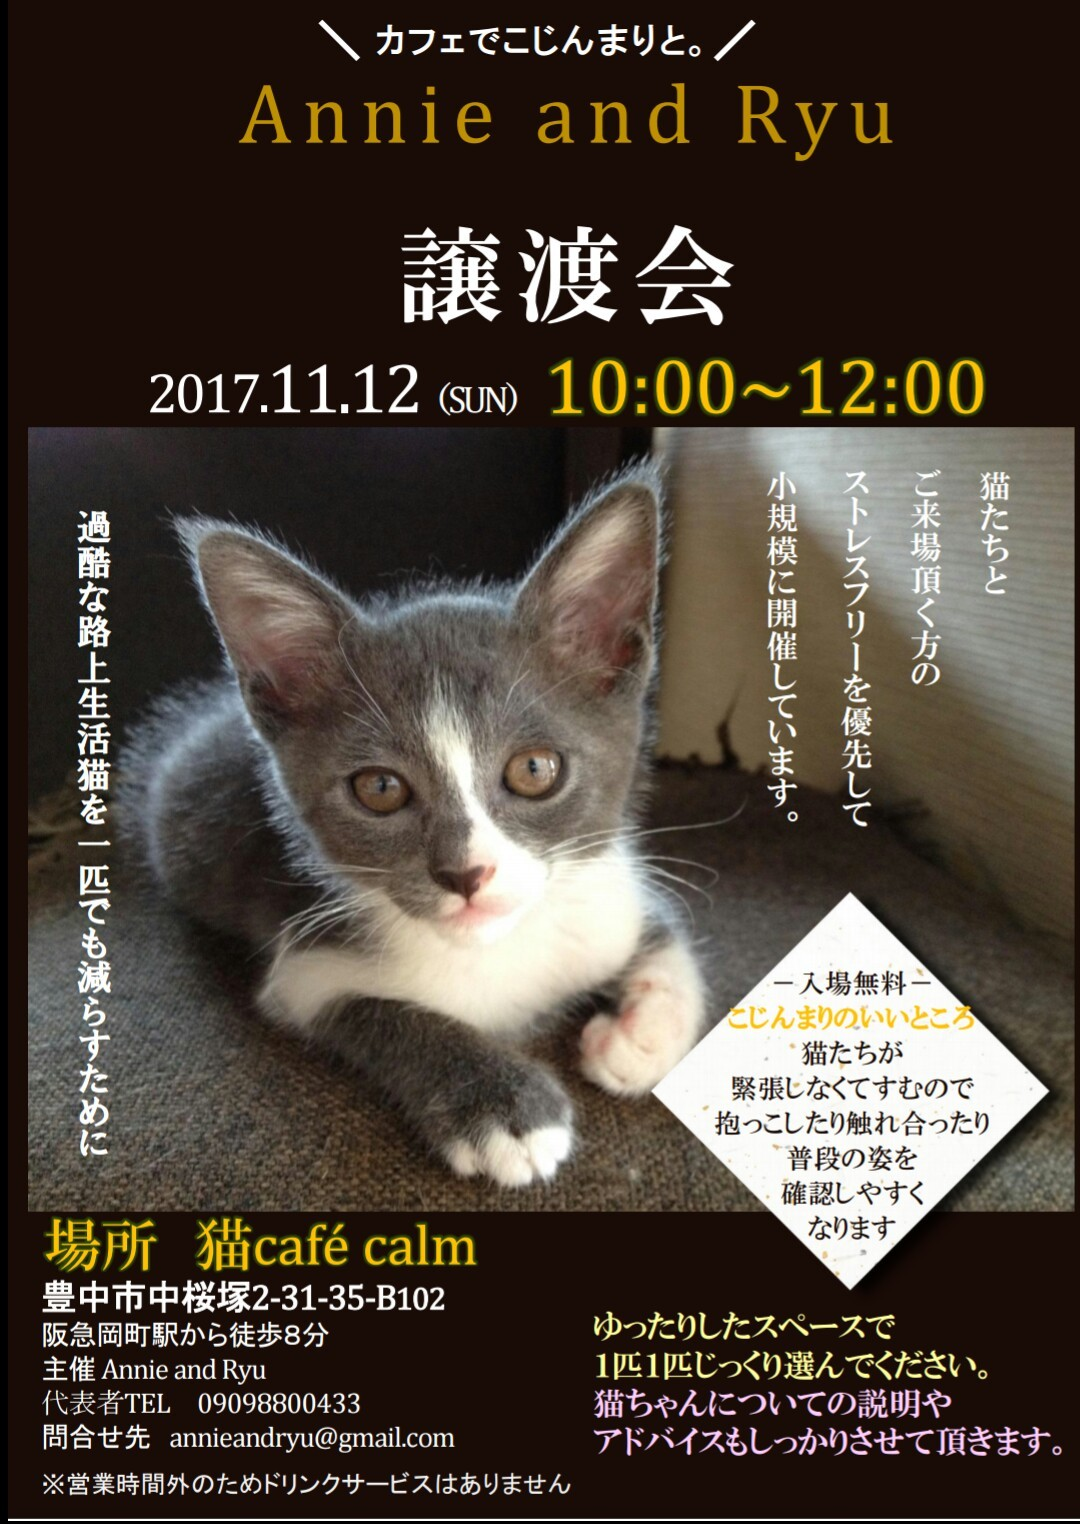 IMG_20171026_175156[1]